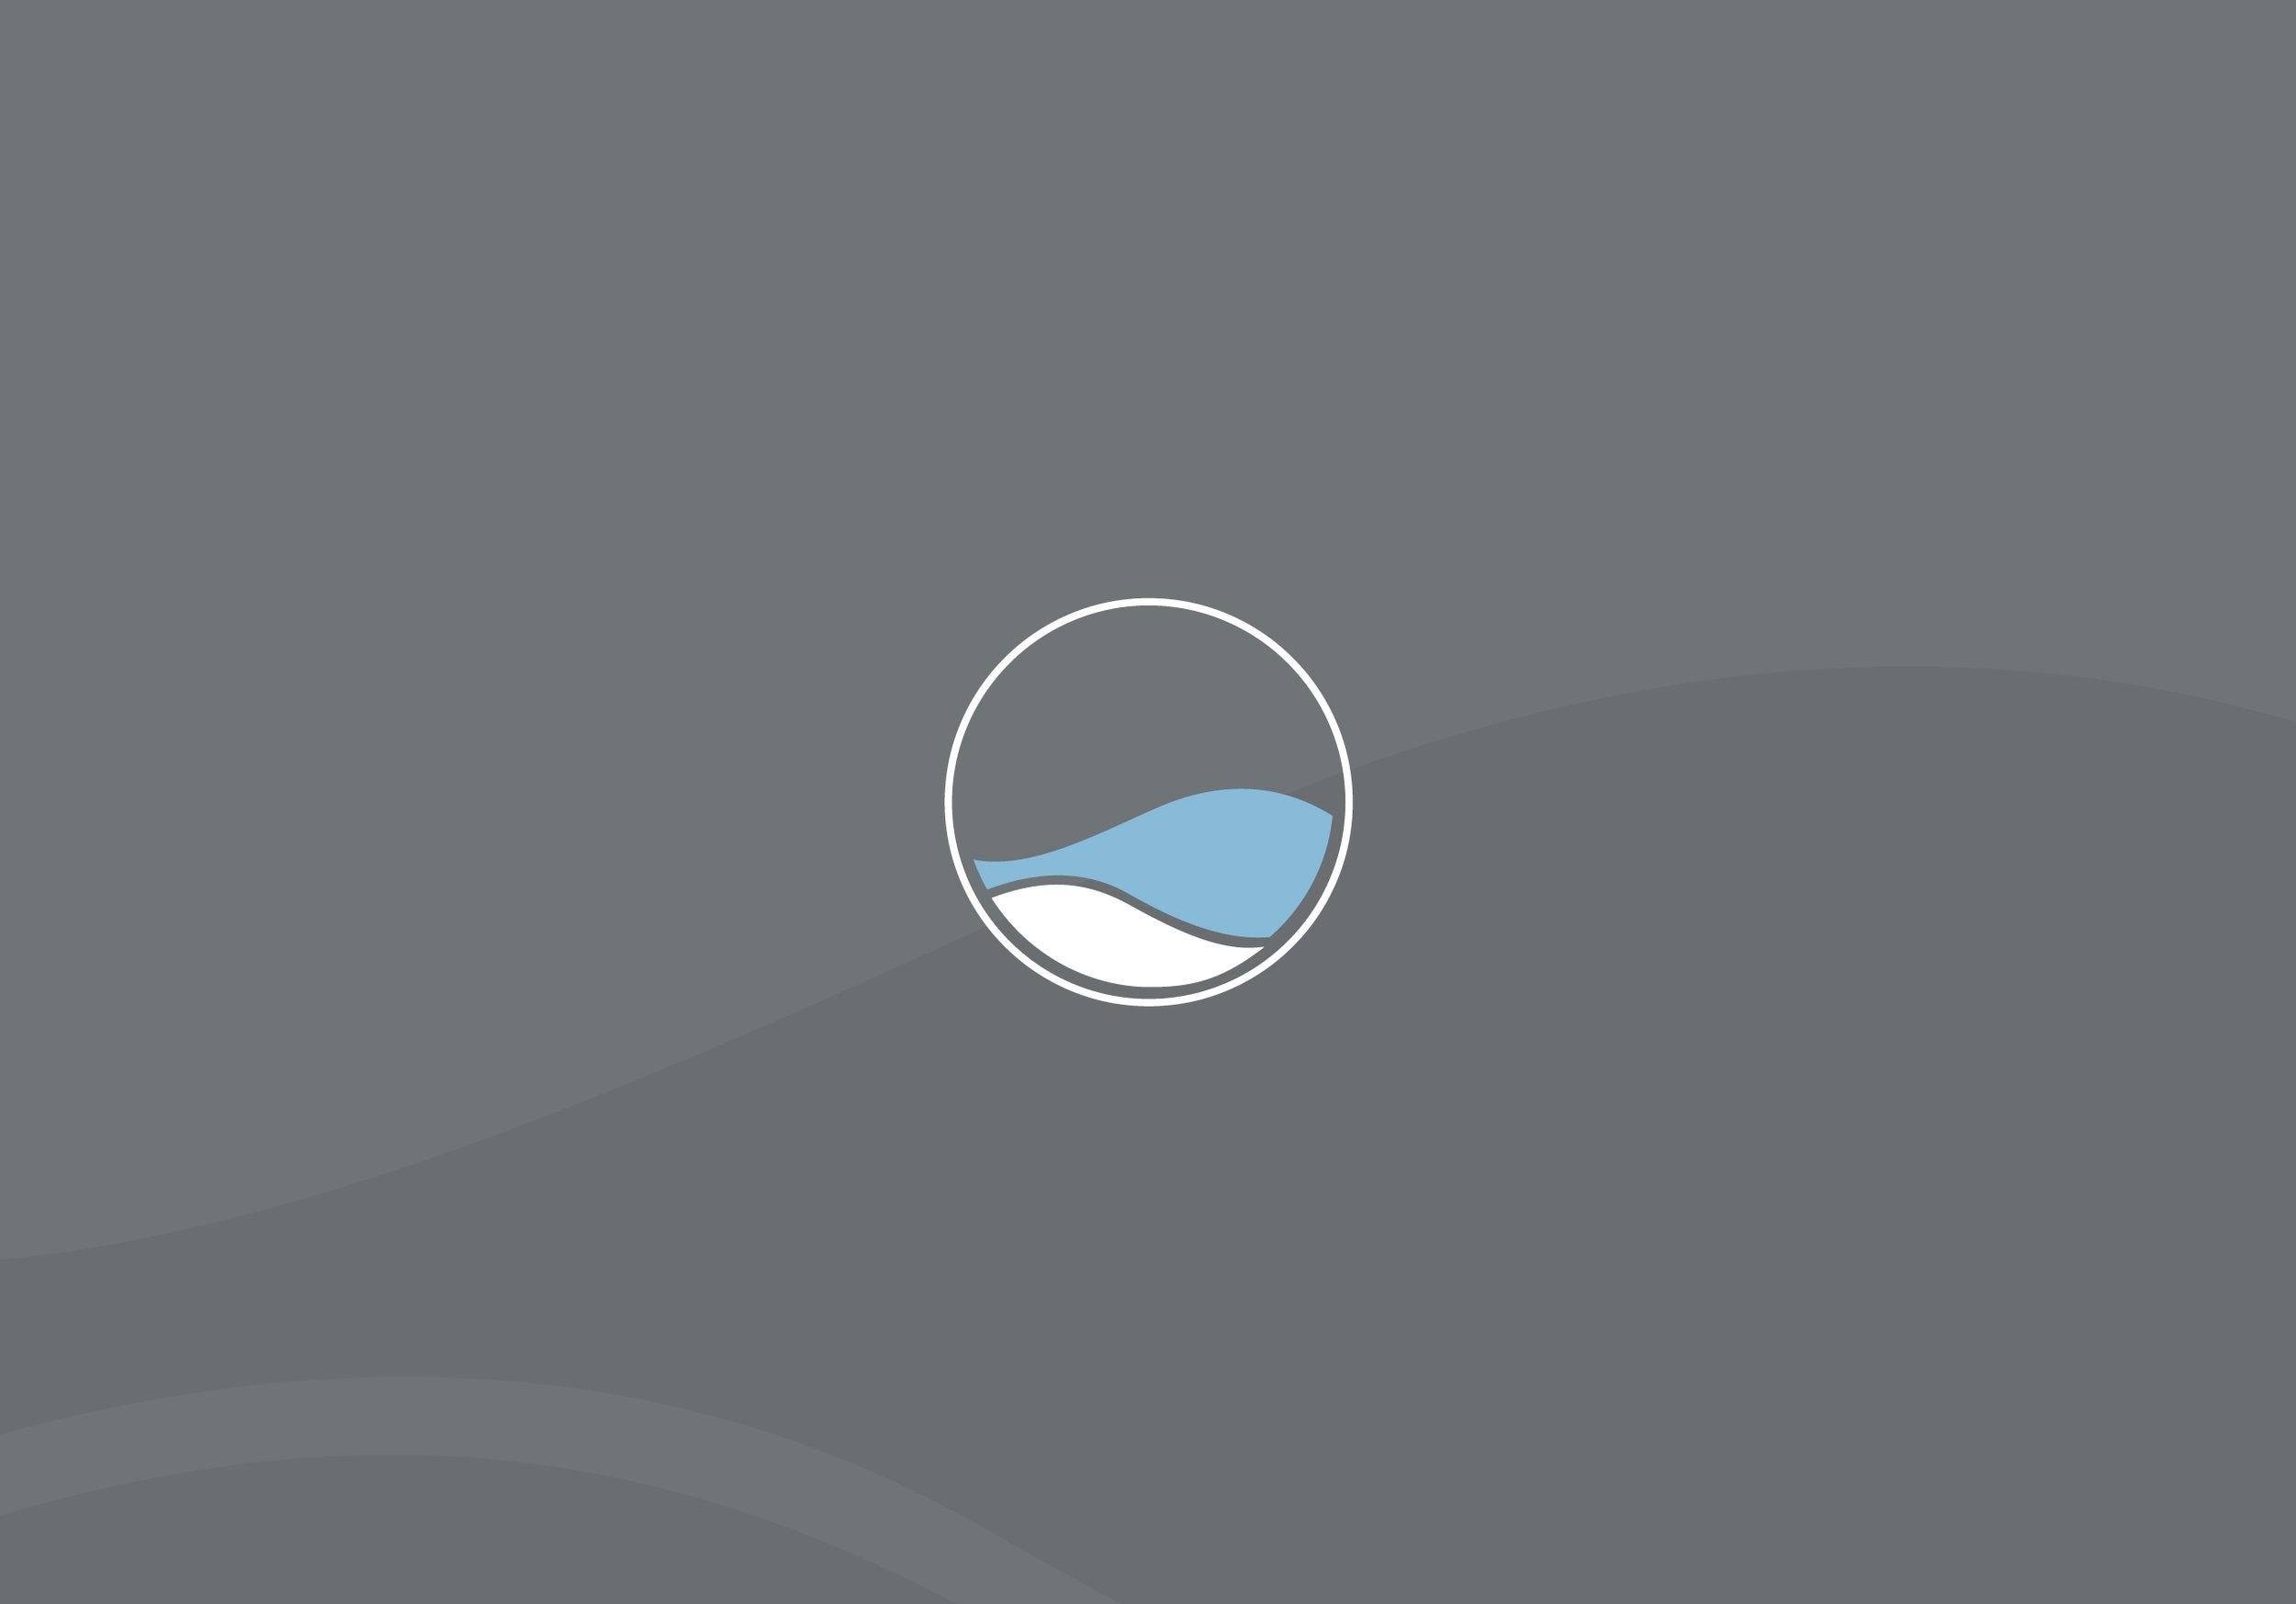 conejo-valley-logo-4.jpg